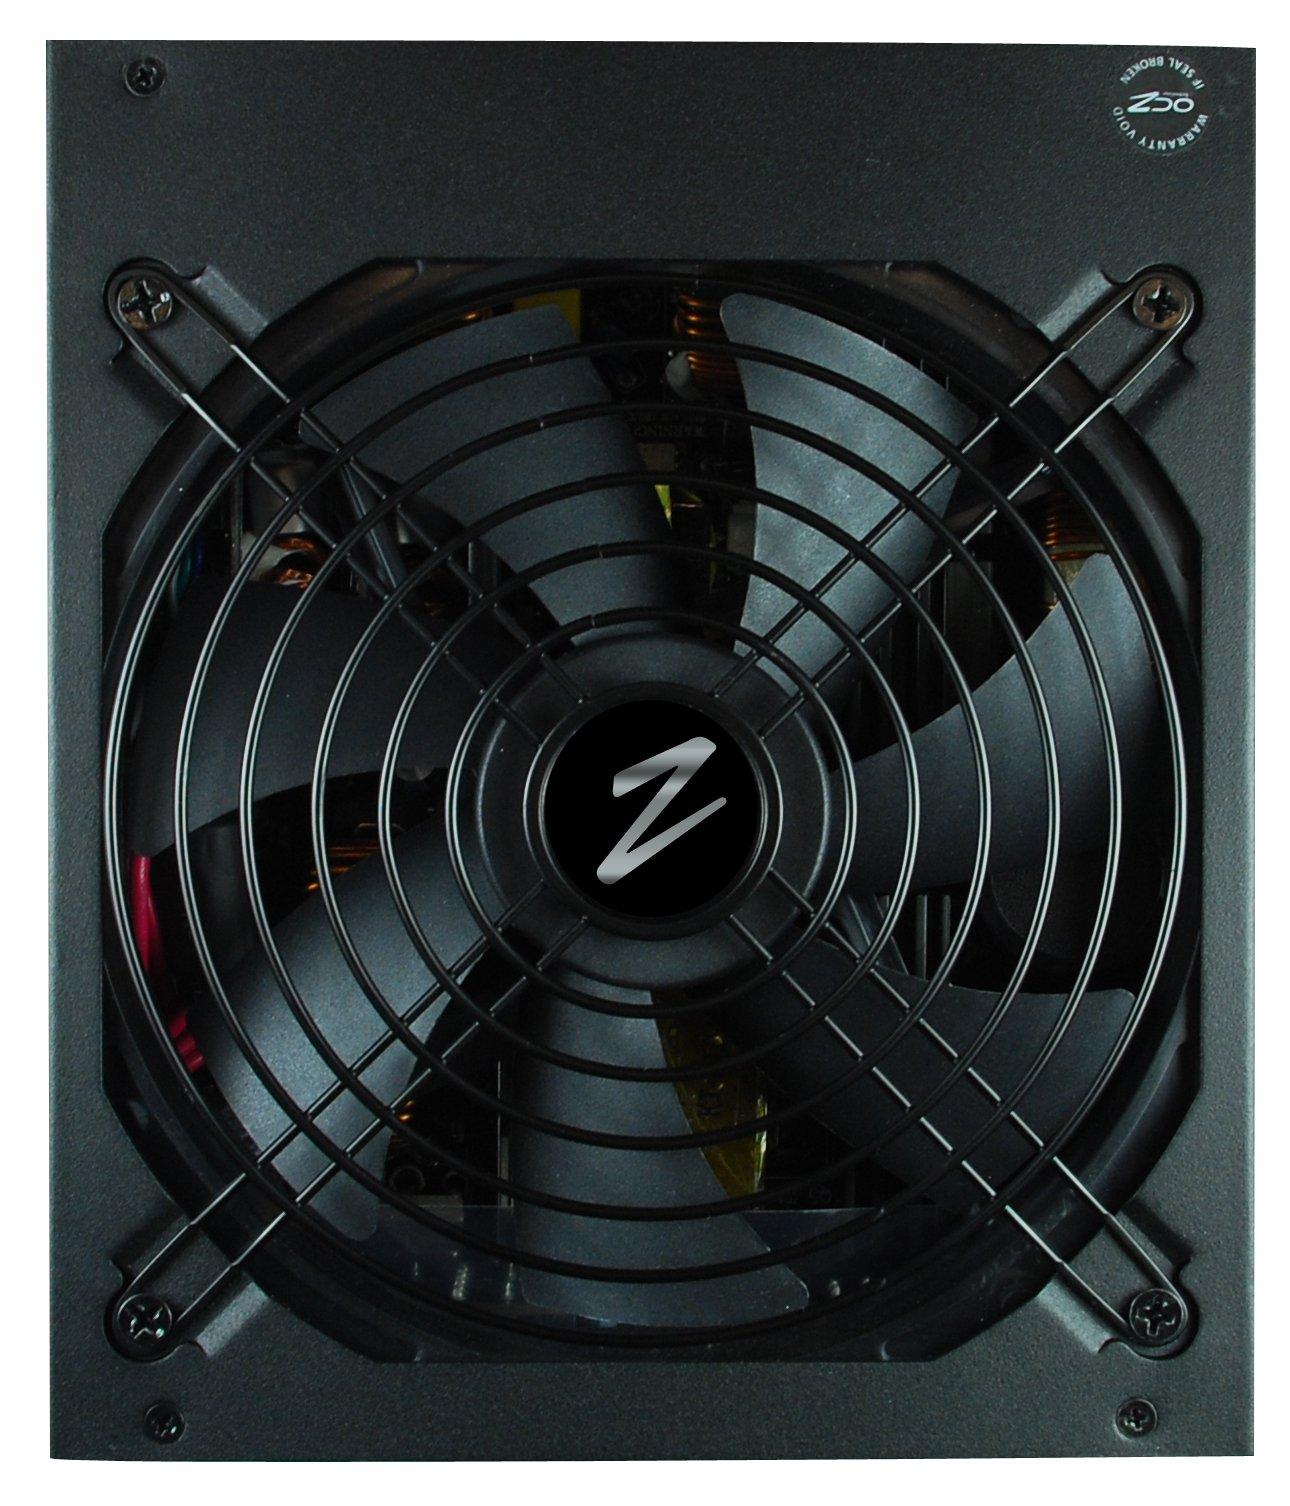 PC Power & Cooling ZX Series 850 Watt (850W) 80+ Gold Fully-Modular Active PFC Performance Grade ATX PC Power Supply 5 Year Warranty OCZ-ZX850W